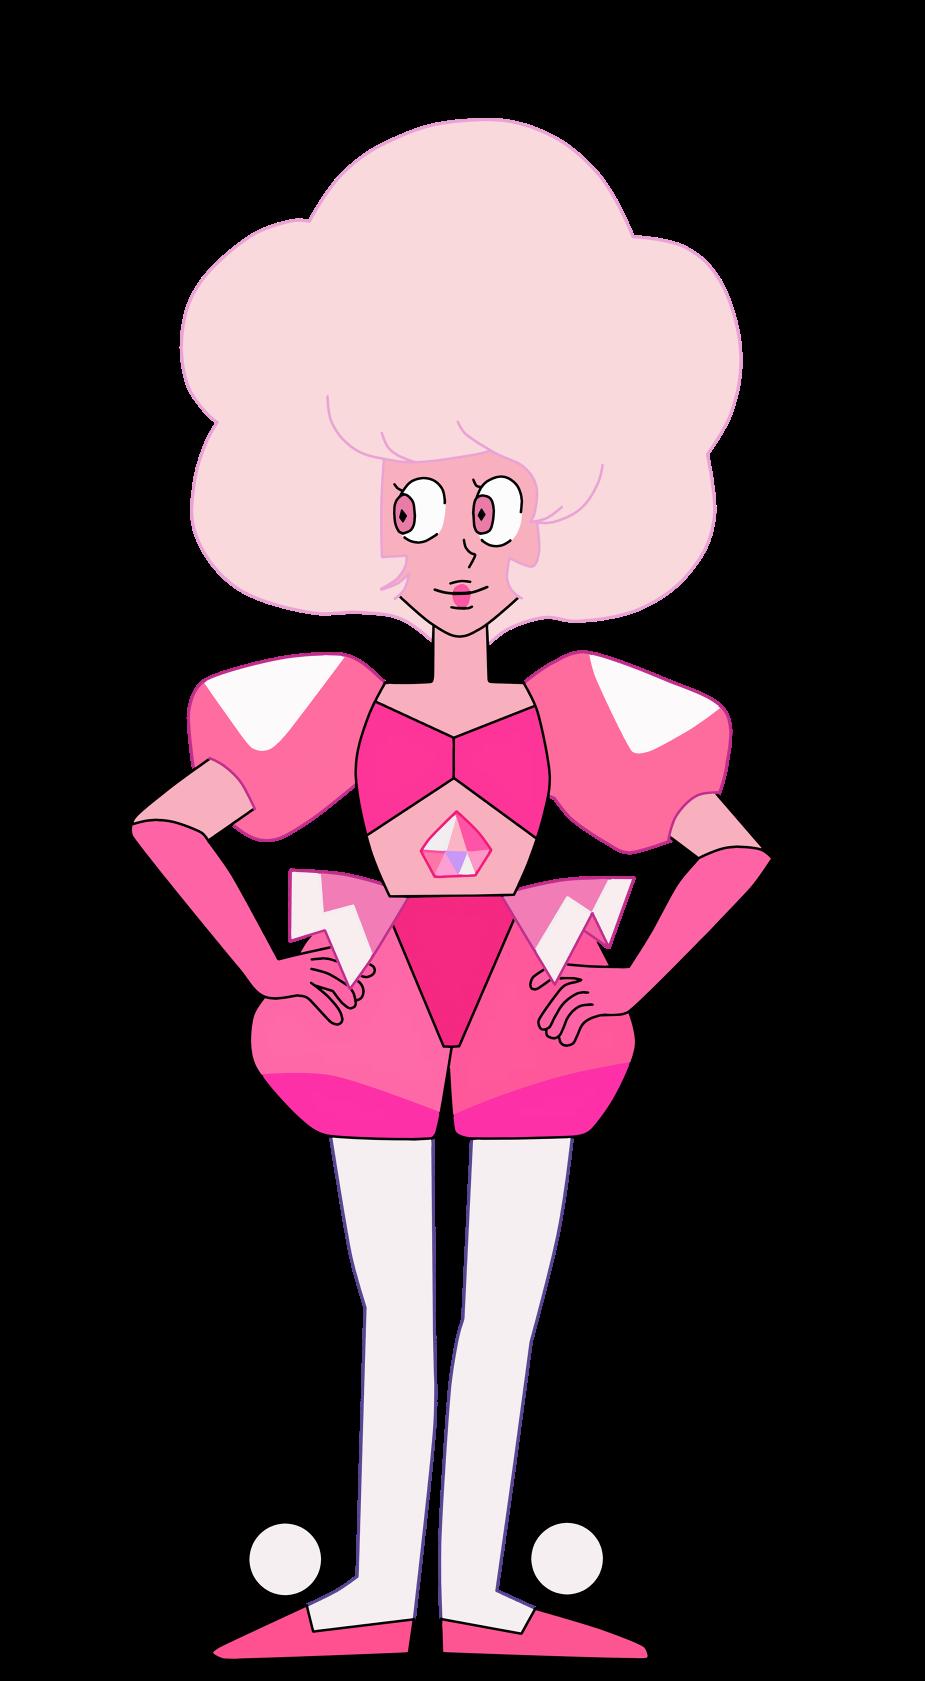 Pin By Karina On Pink Diamond Steven Universe Steven Universe Gem Pink Diamond Steven Universe Steven Universe